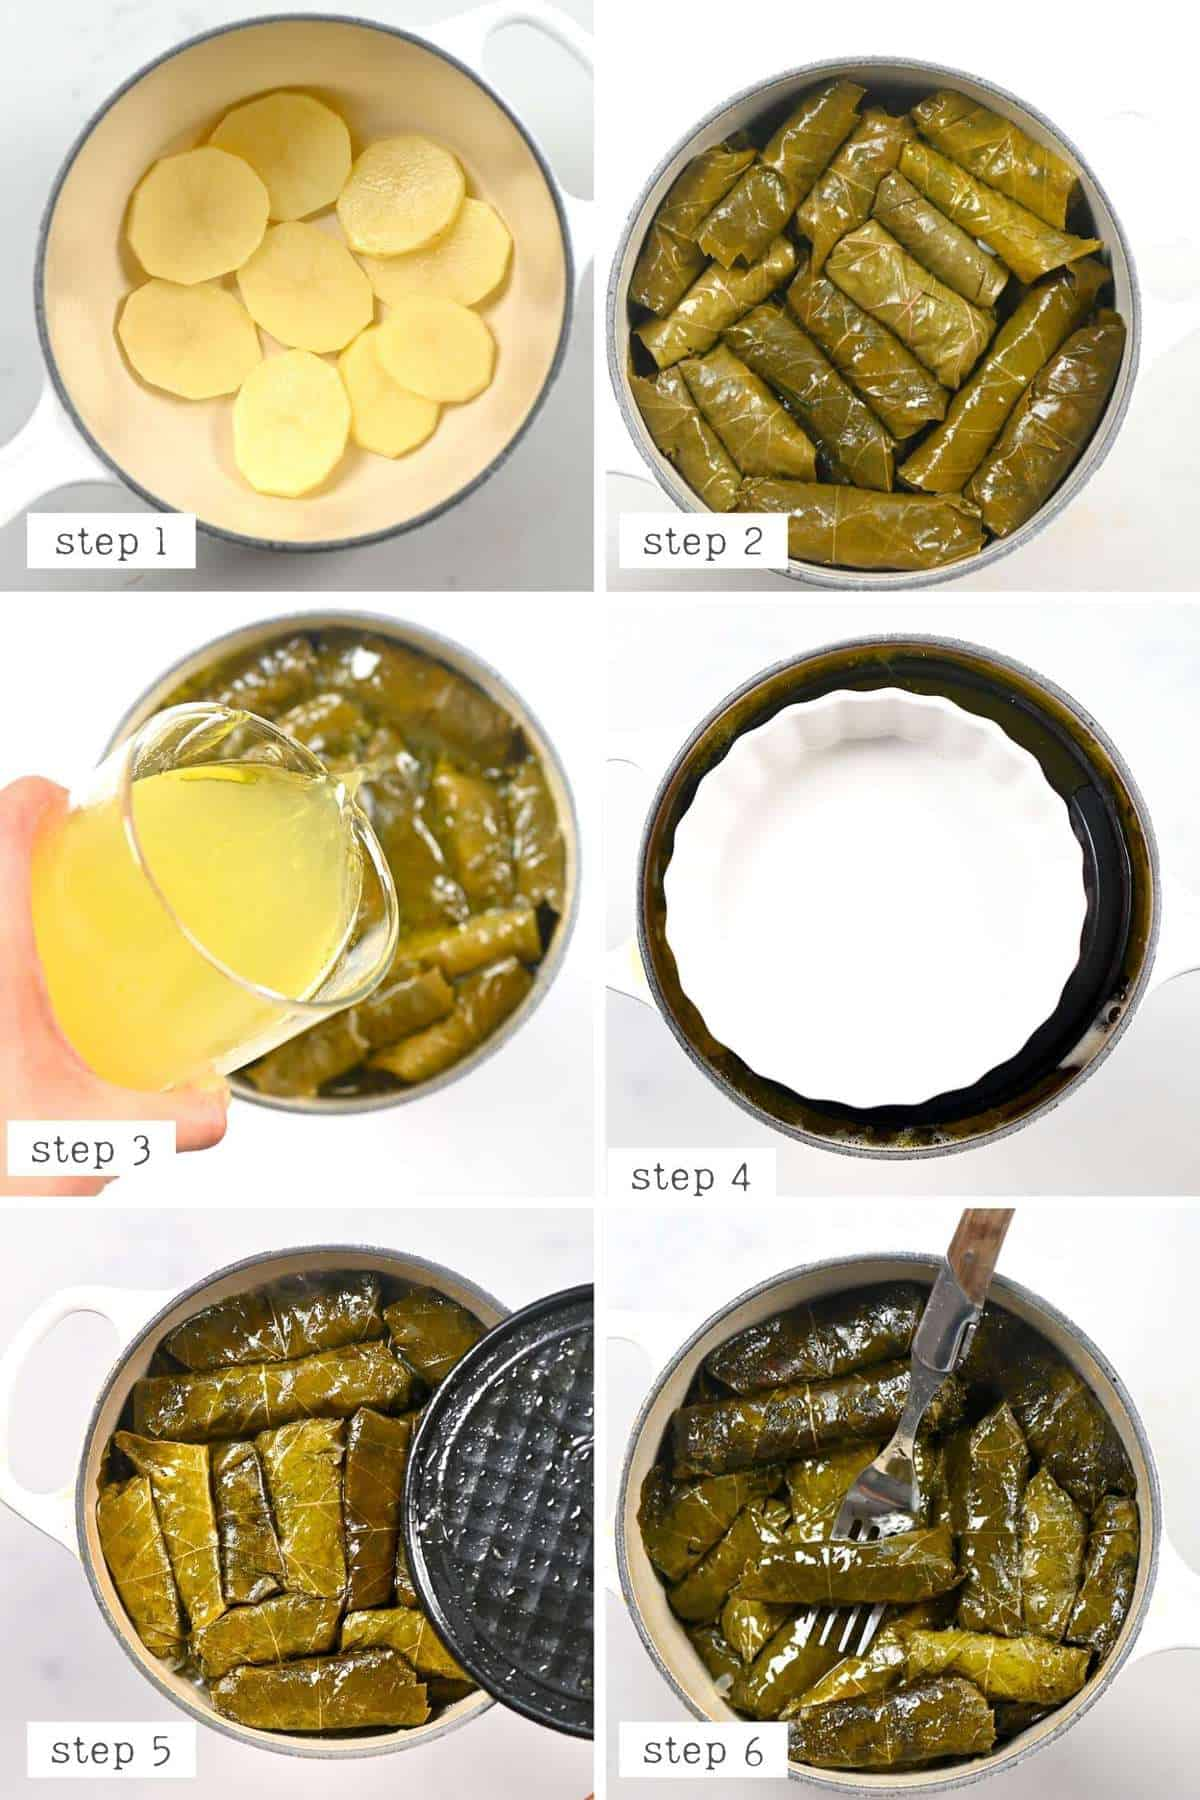 Steps for cooking vine leaves